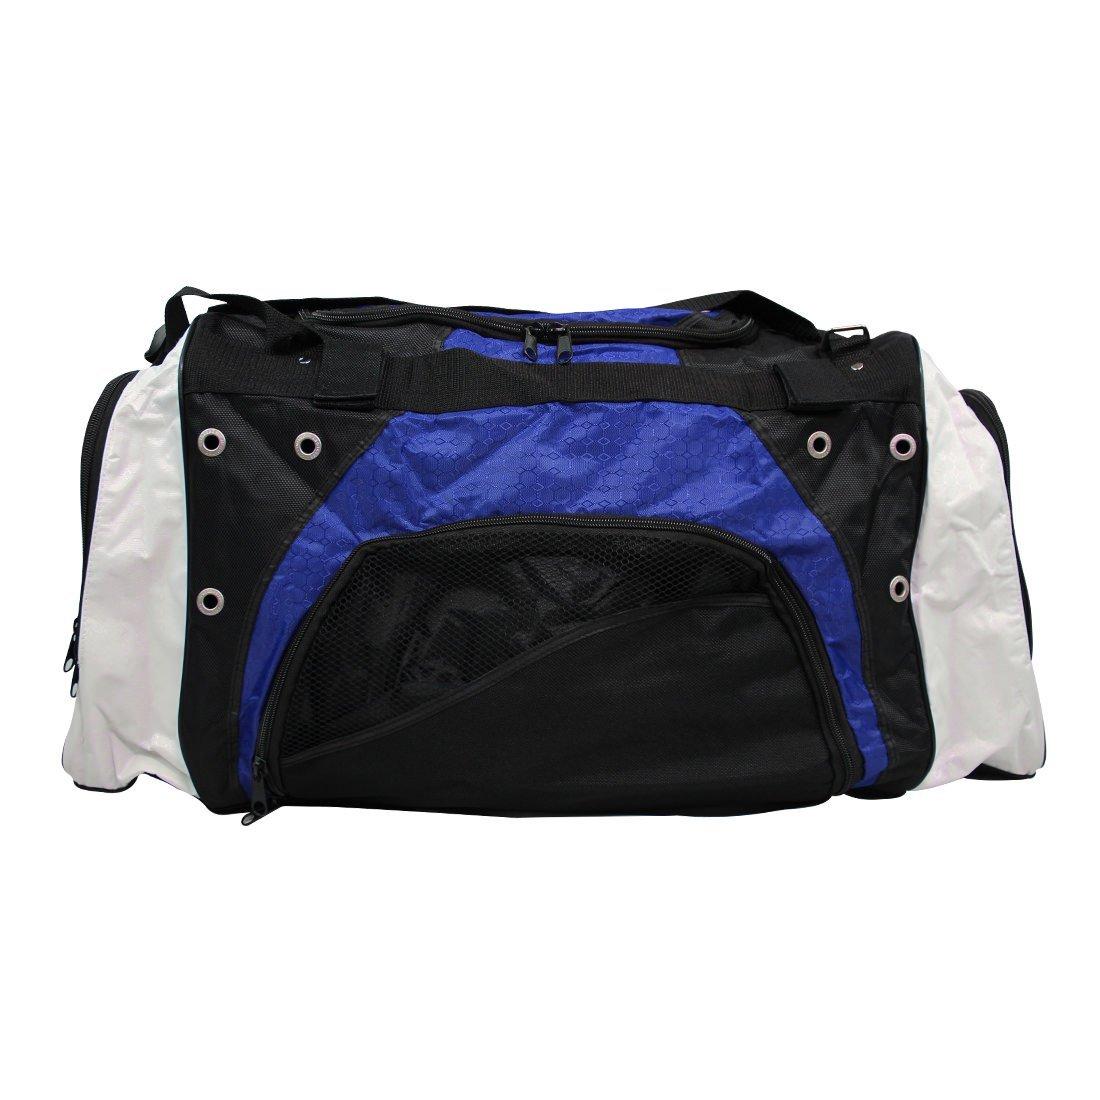 Lacrosse Unlimited Recon Duffle Bag - Royal